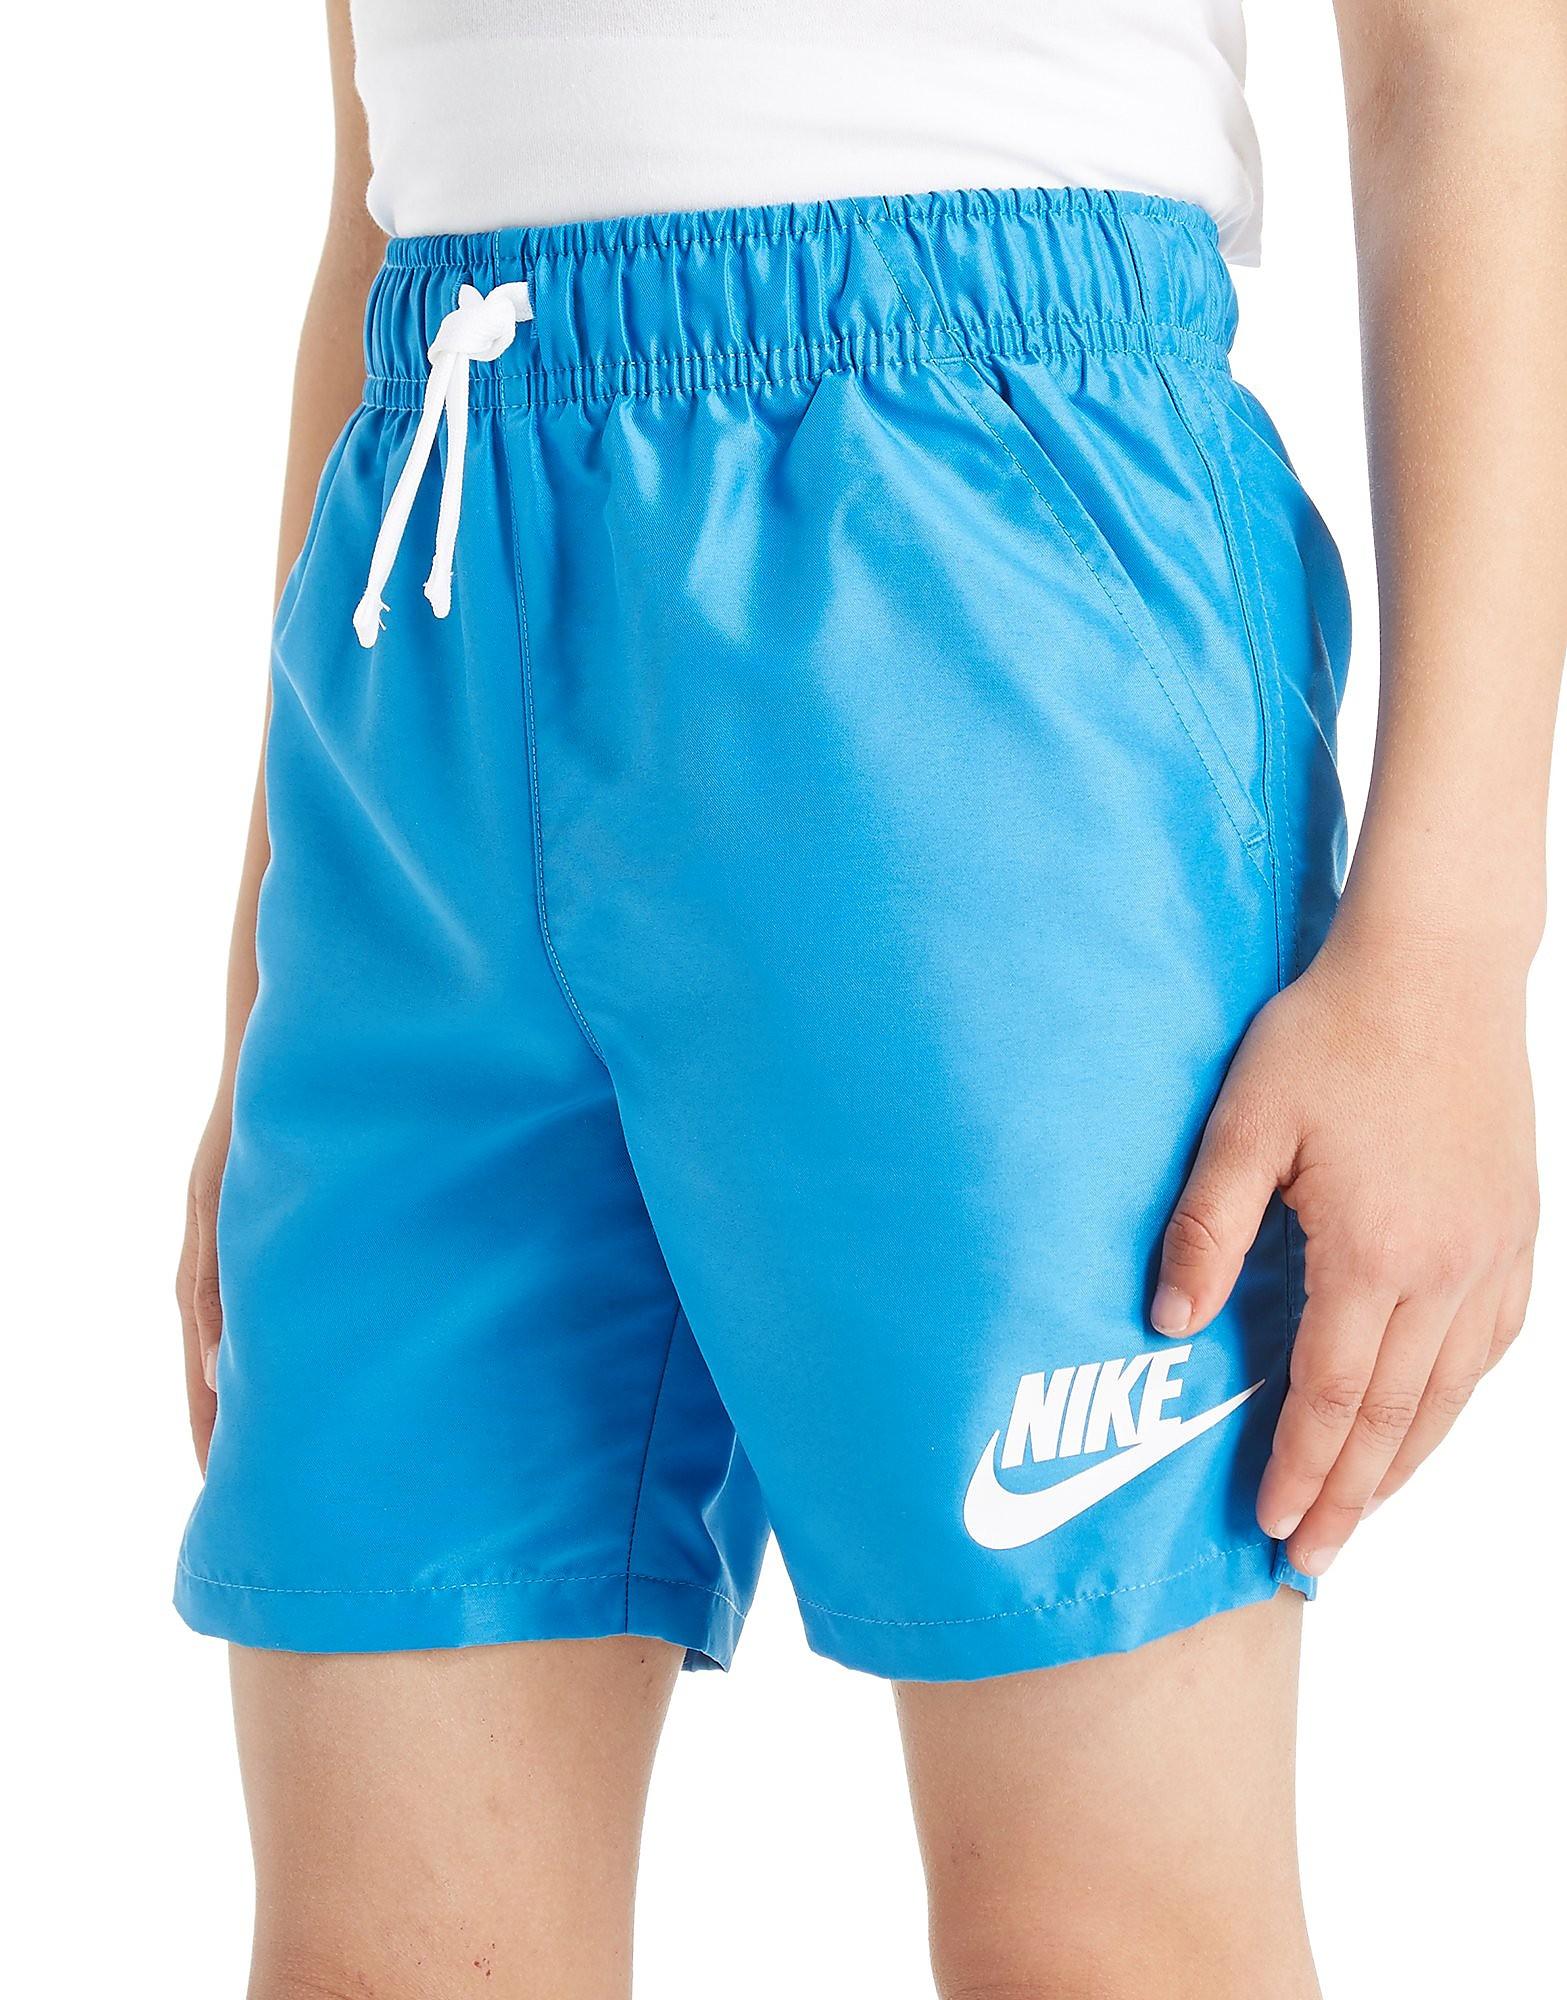 Nike Flow Badbyxor Barn